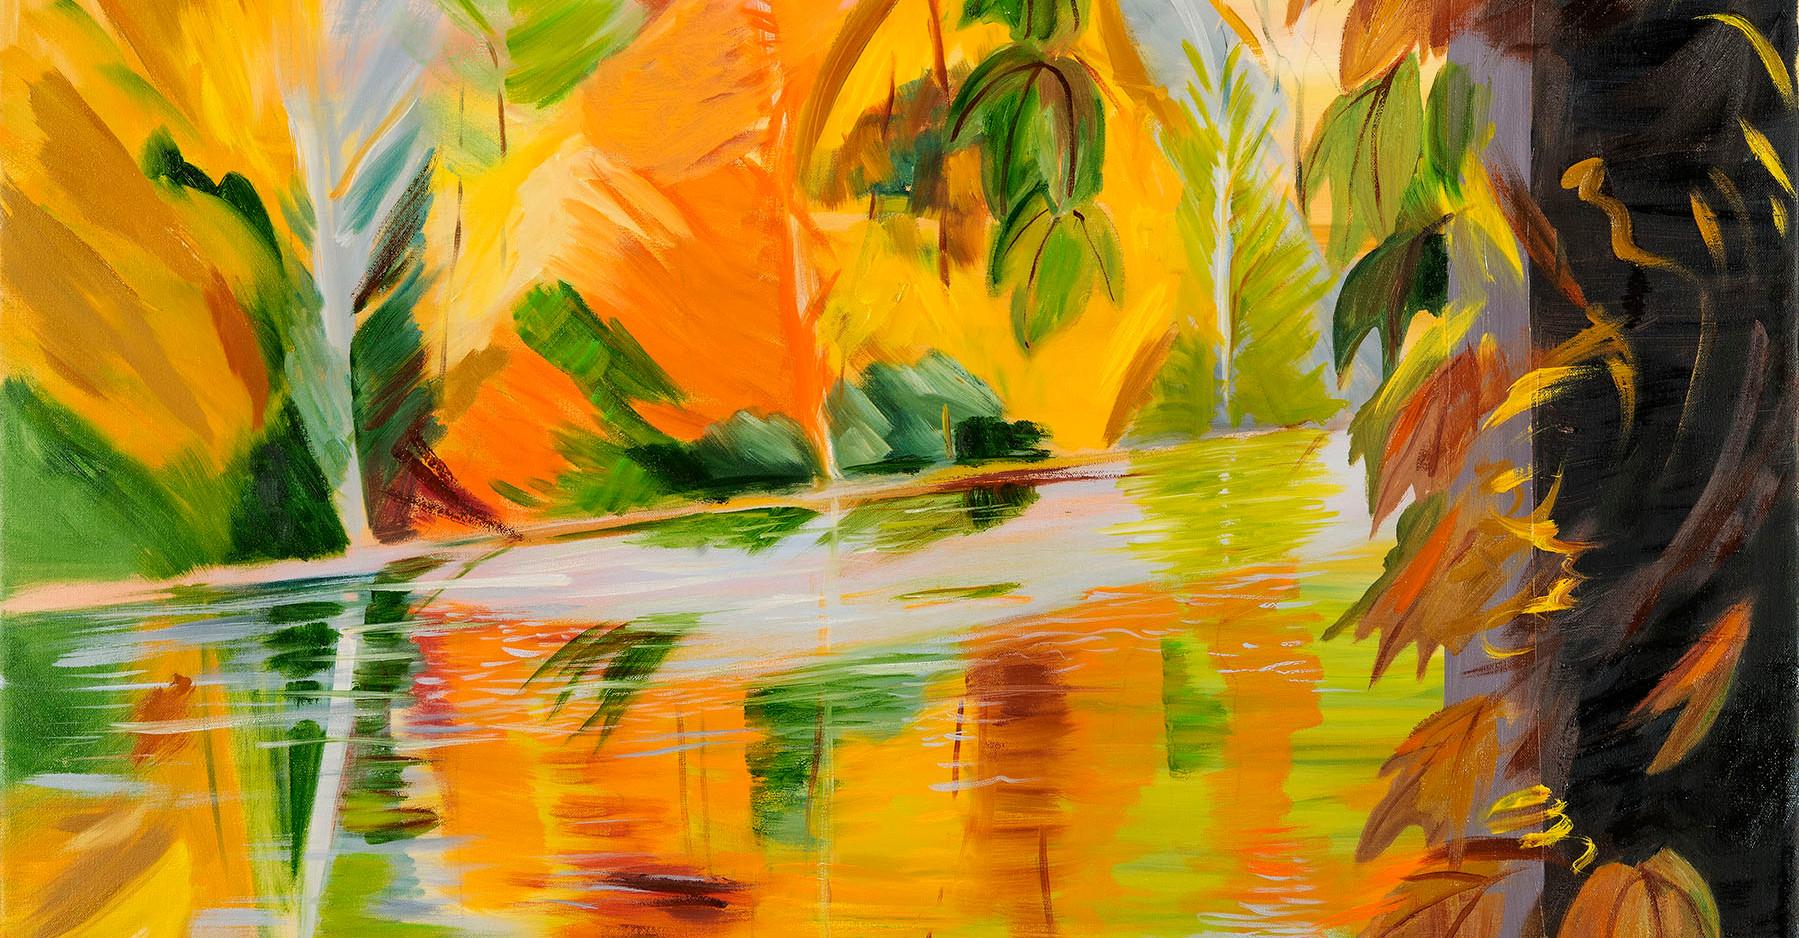 Dreams of Autumn, 36x36